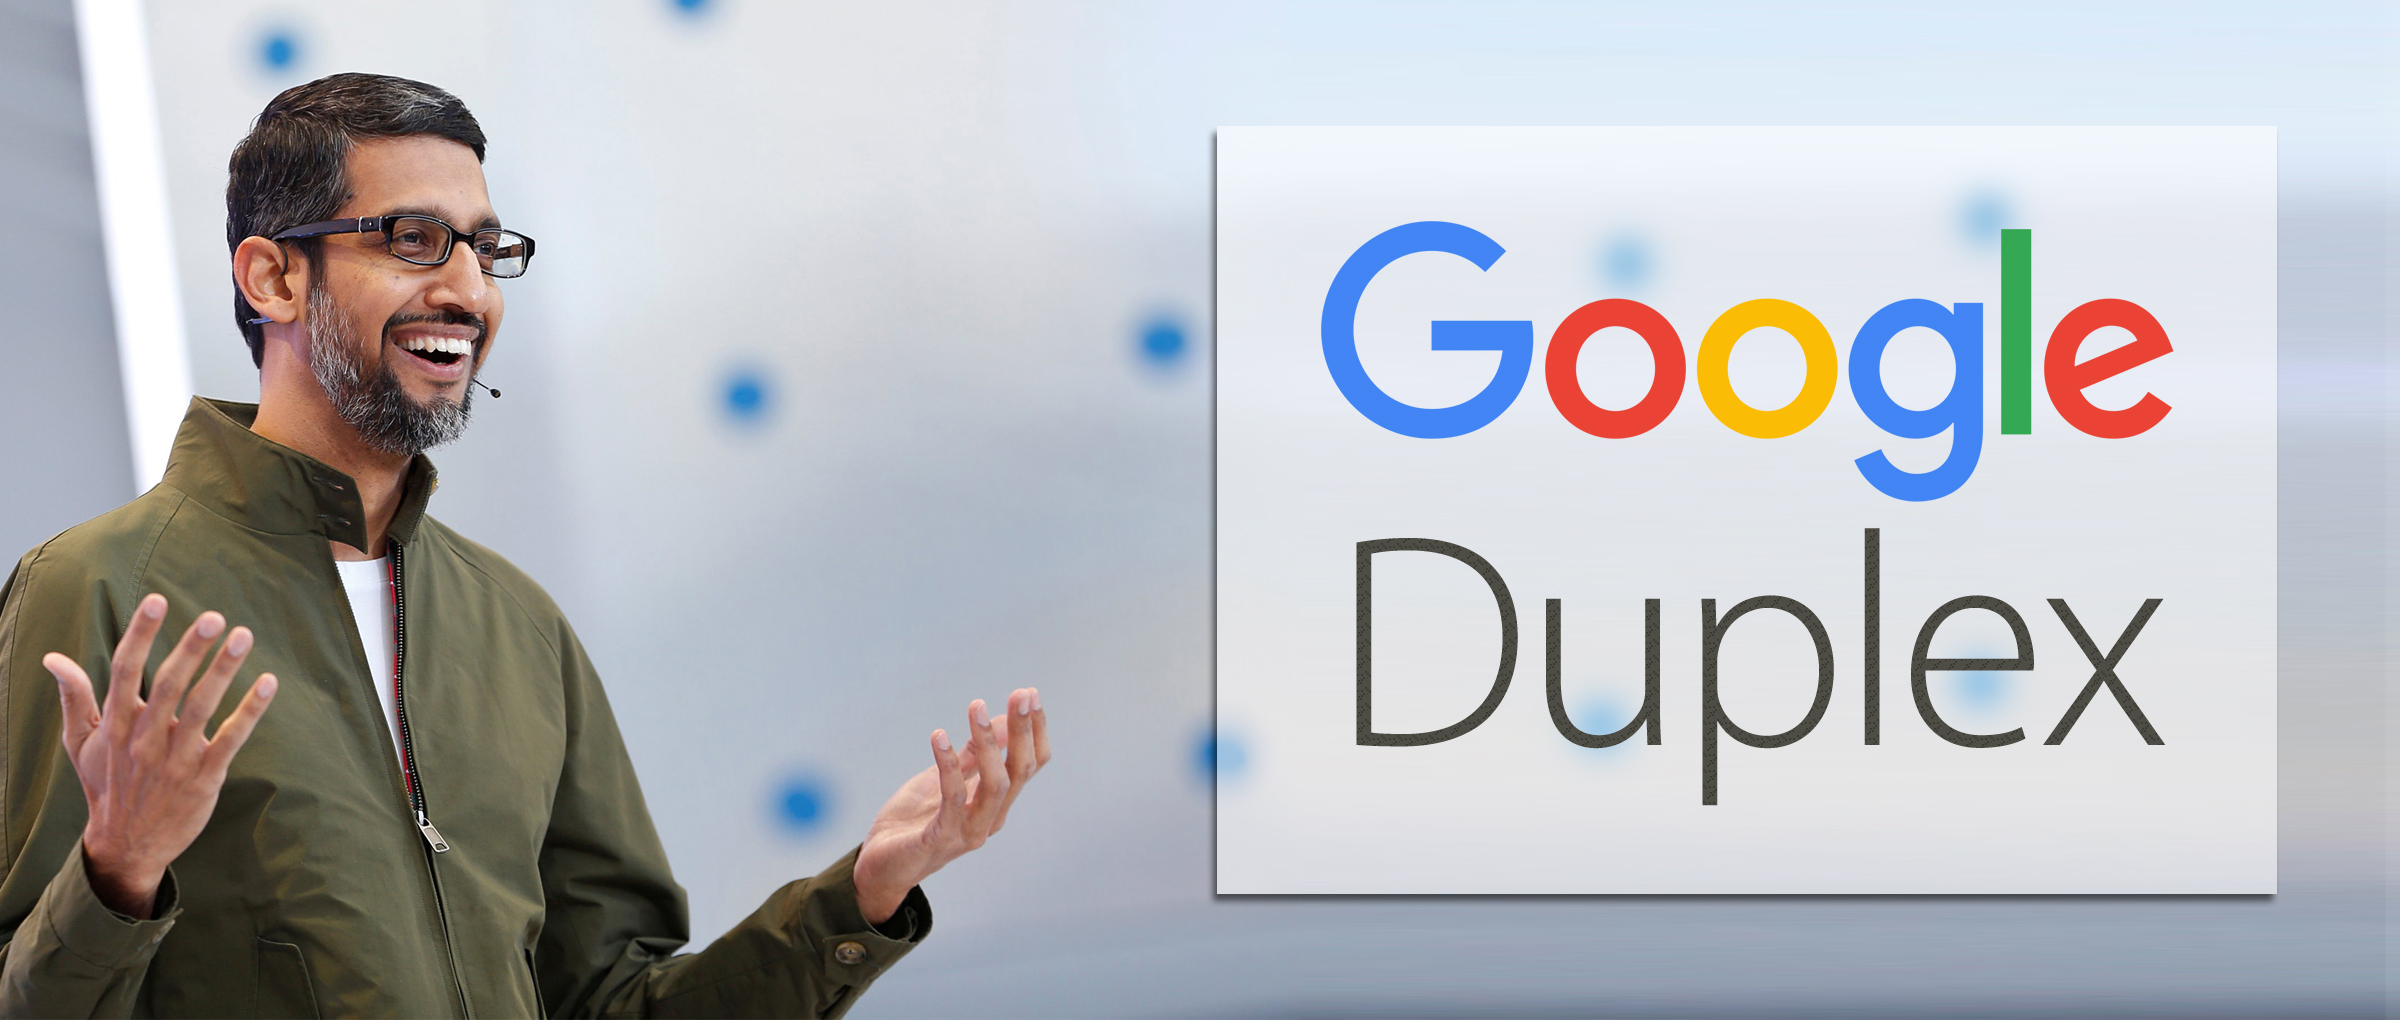 Google Duplex è in fase di test, anche nei call center, ma suscita problemi di natura etica